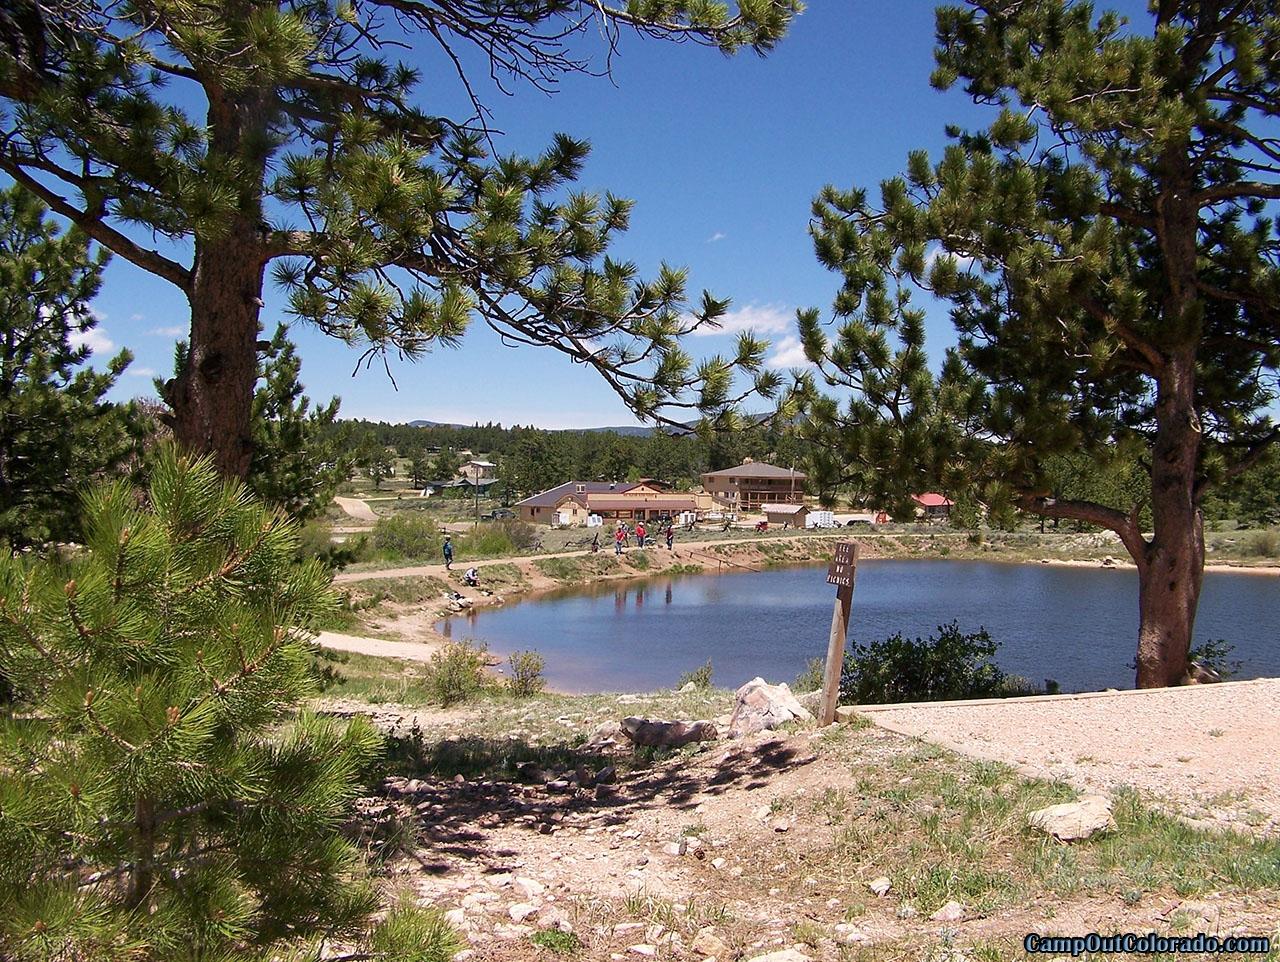 campoutcolorado-west-lake-dam-day-use-boat-ramp